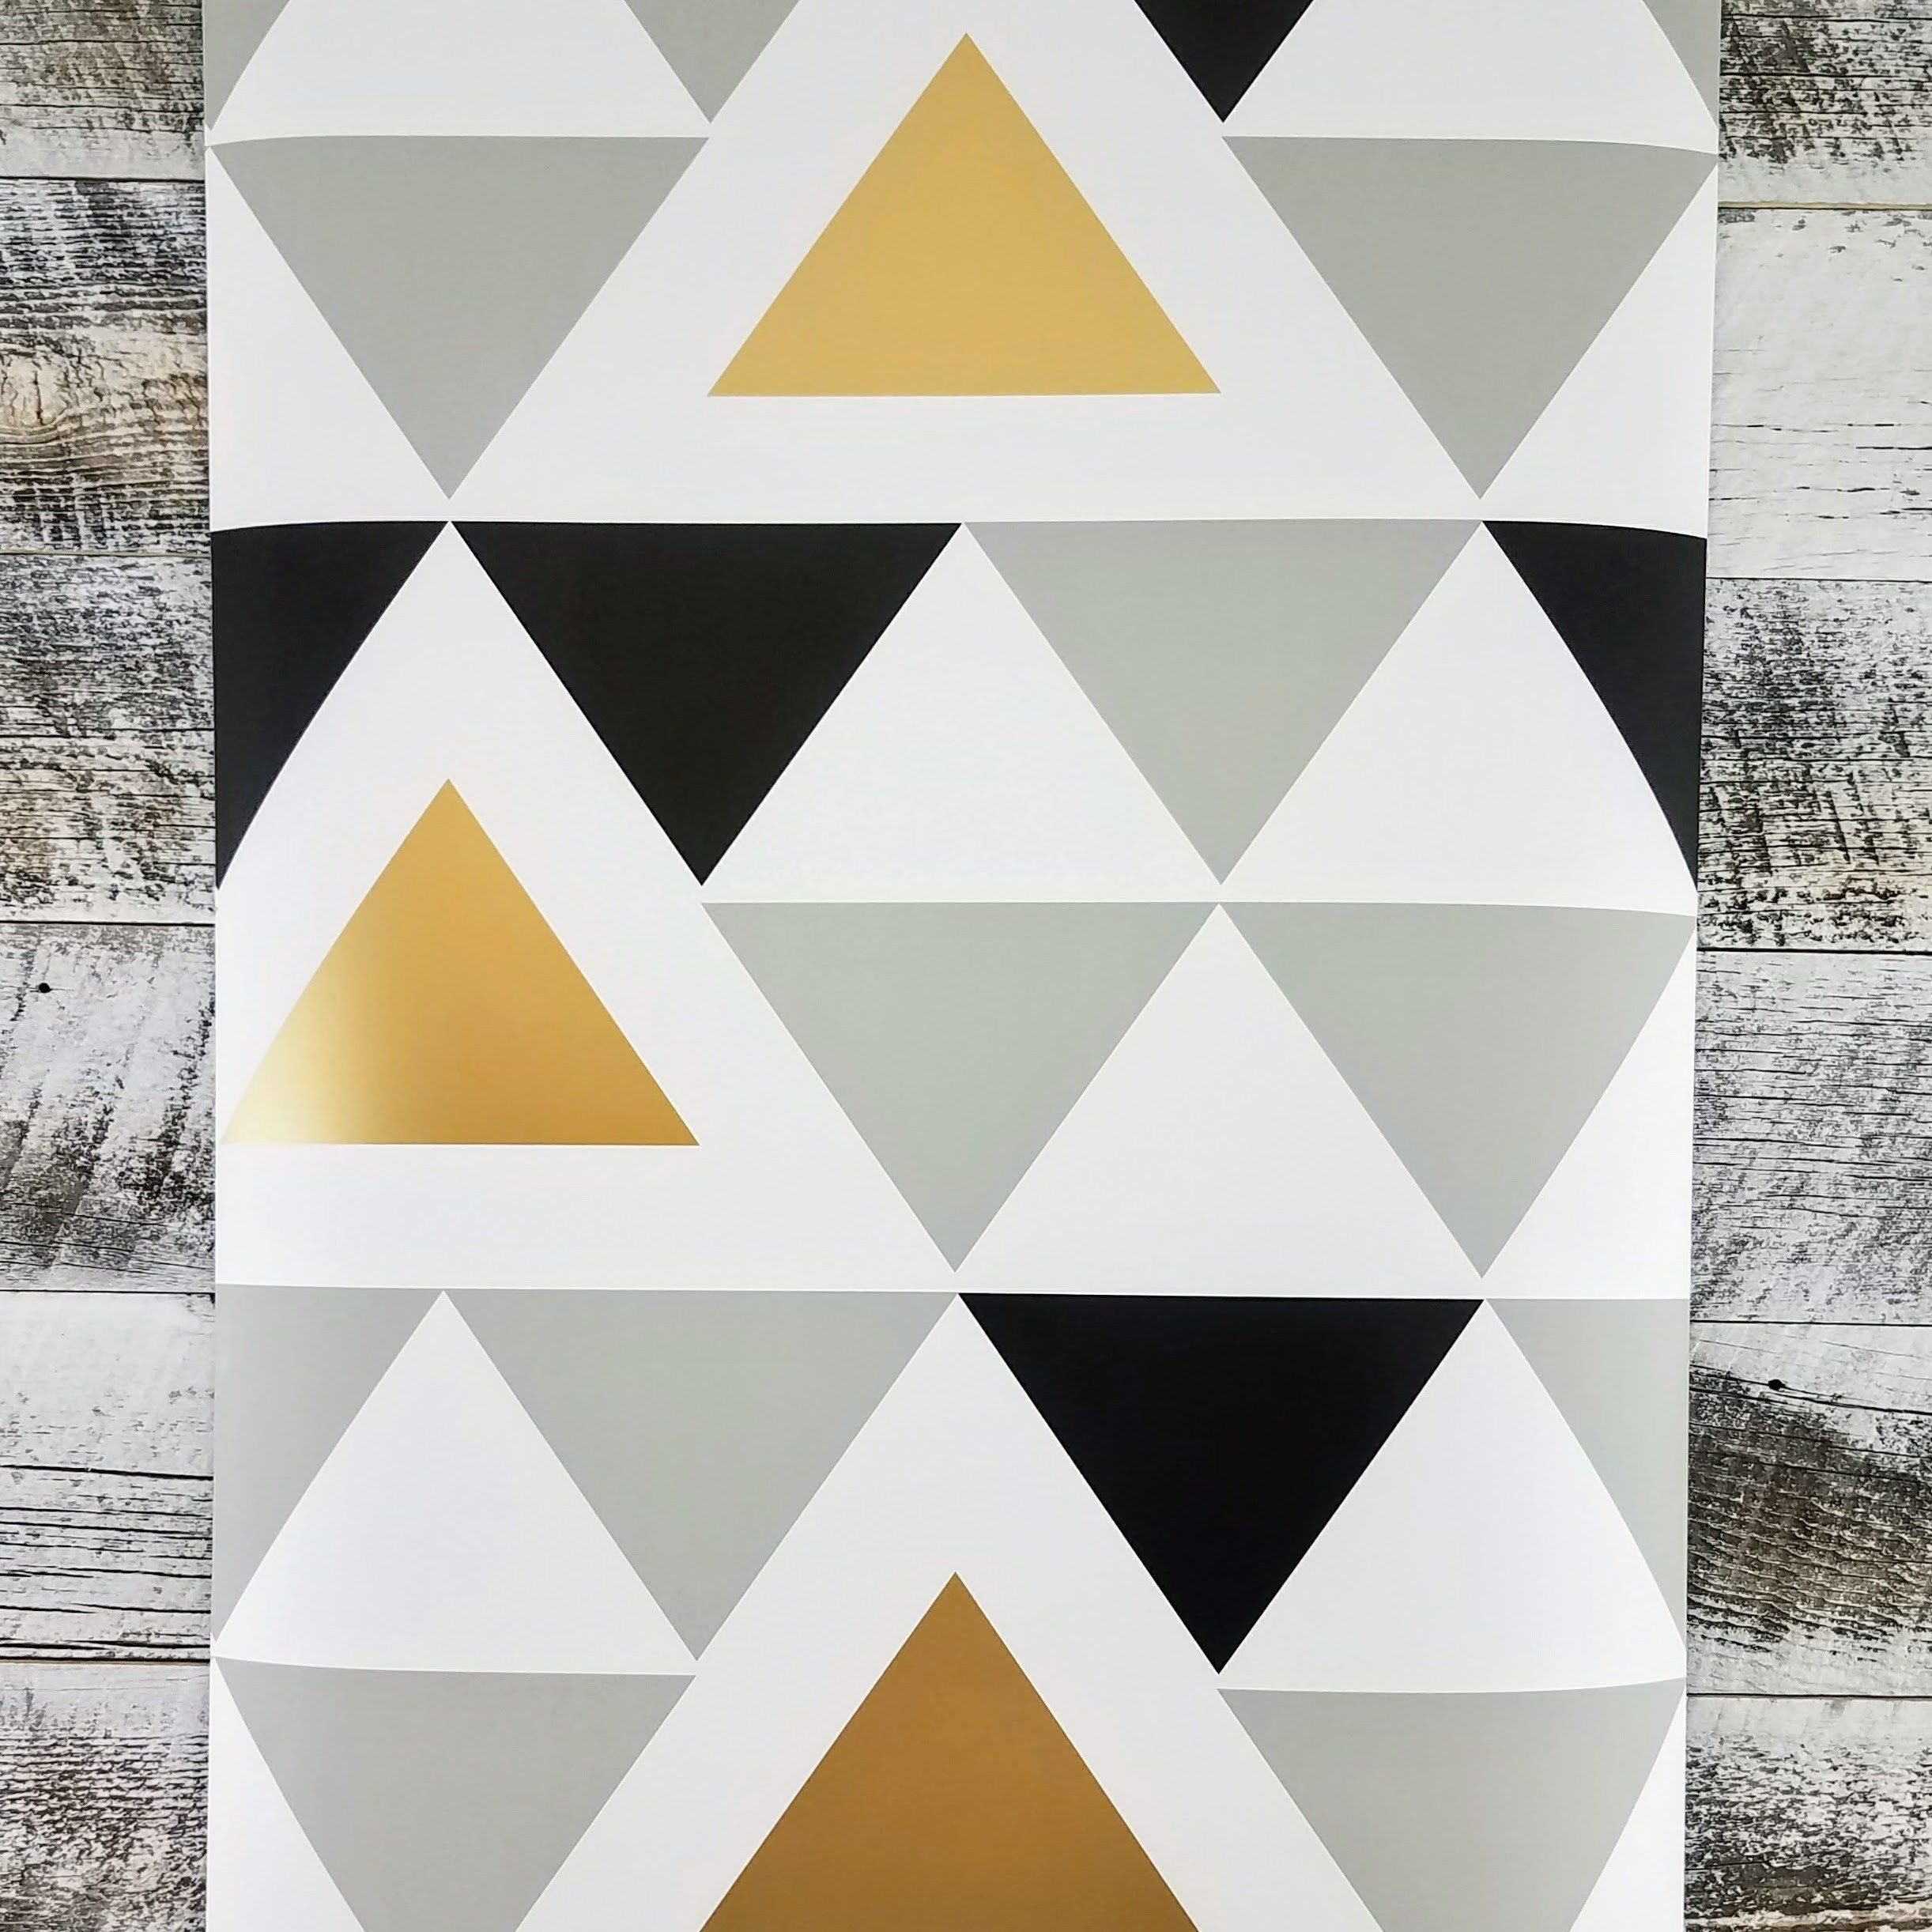 Aztec Black Gold Geometric Triangle Peel And Stick Wallpaper Peel And Stick Wallpaper Diy Wallpaper Geometric Triangle